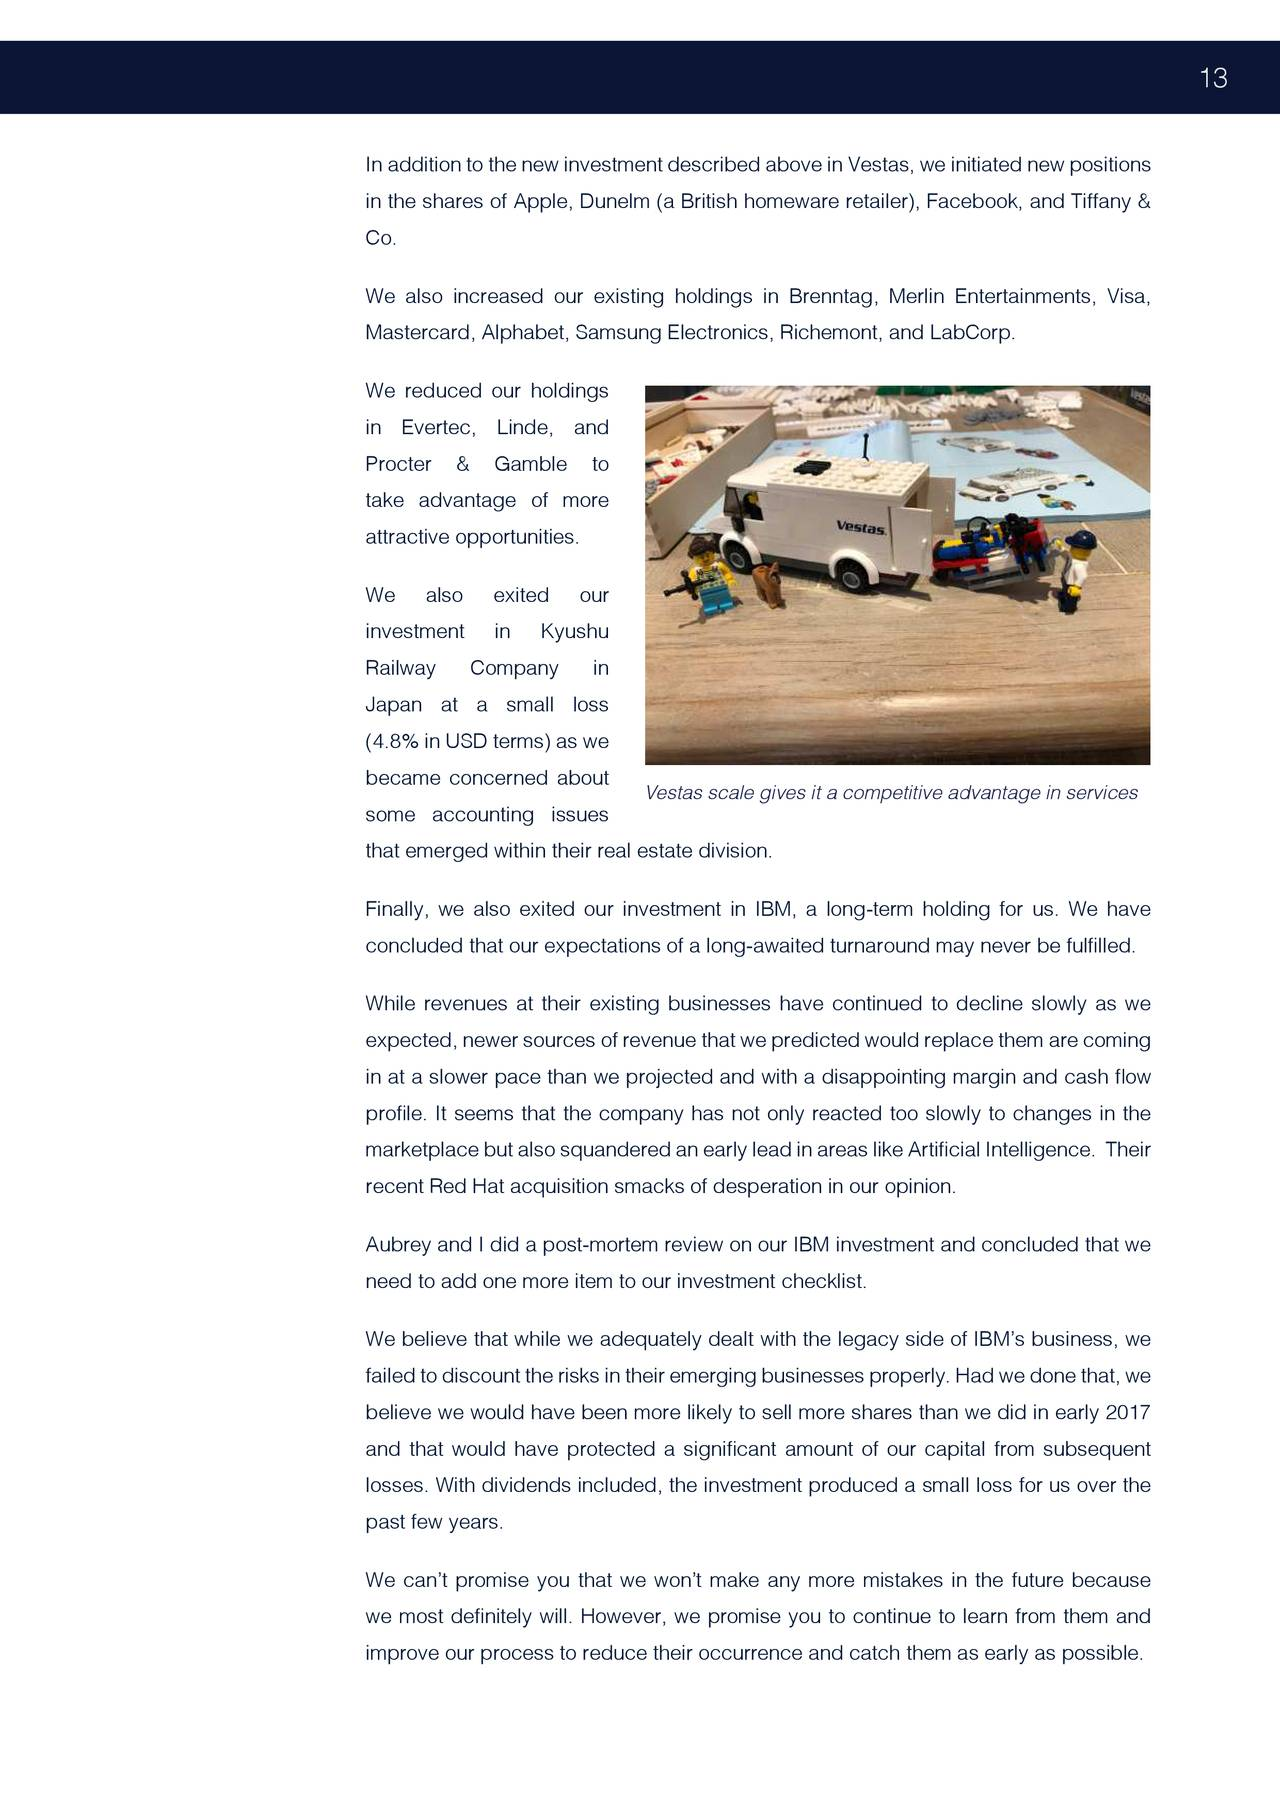 Mayar Fund Letter To Partners Calendar Year 2018 - Vestas